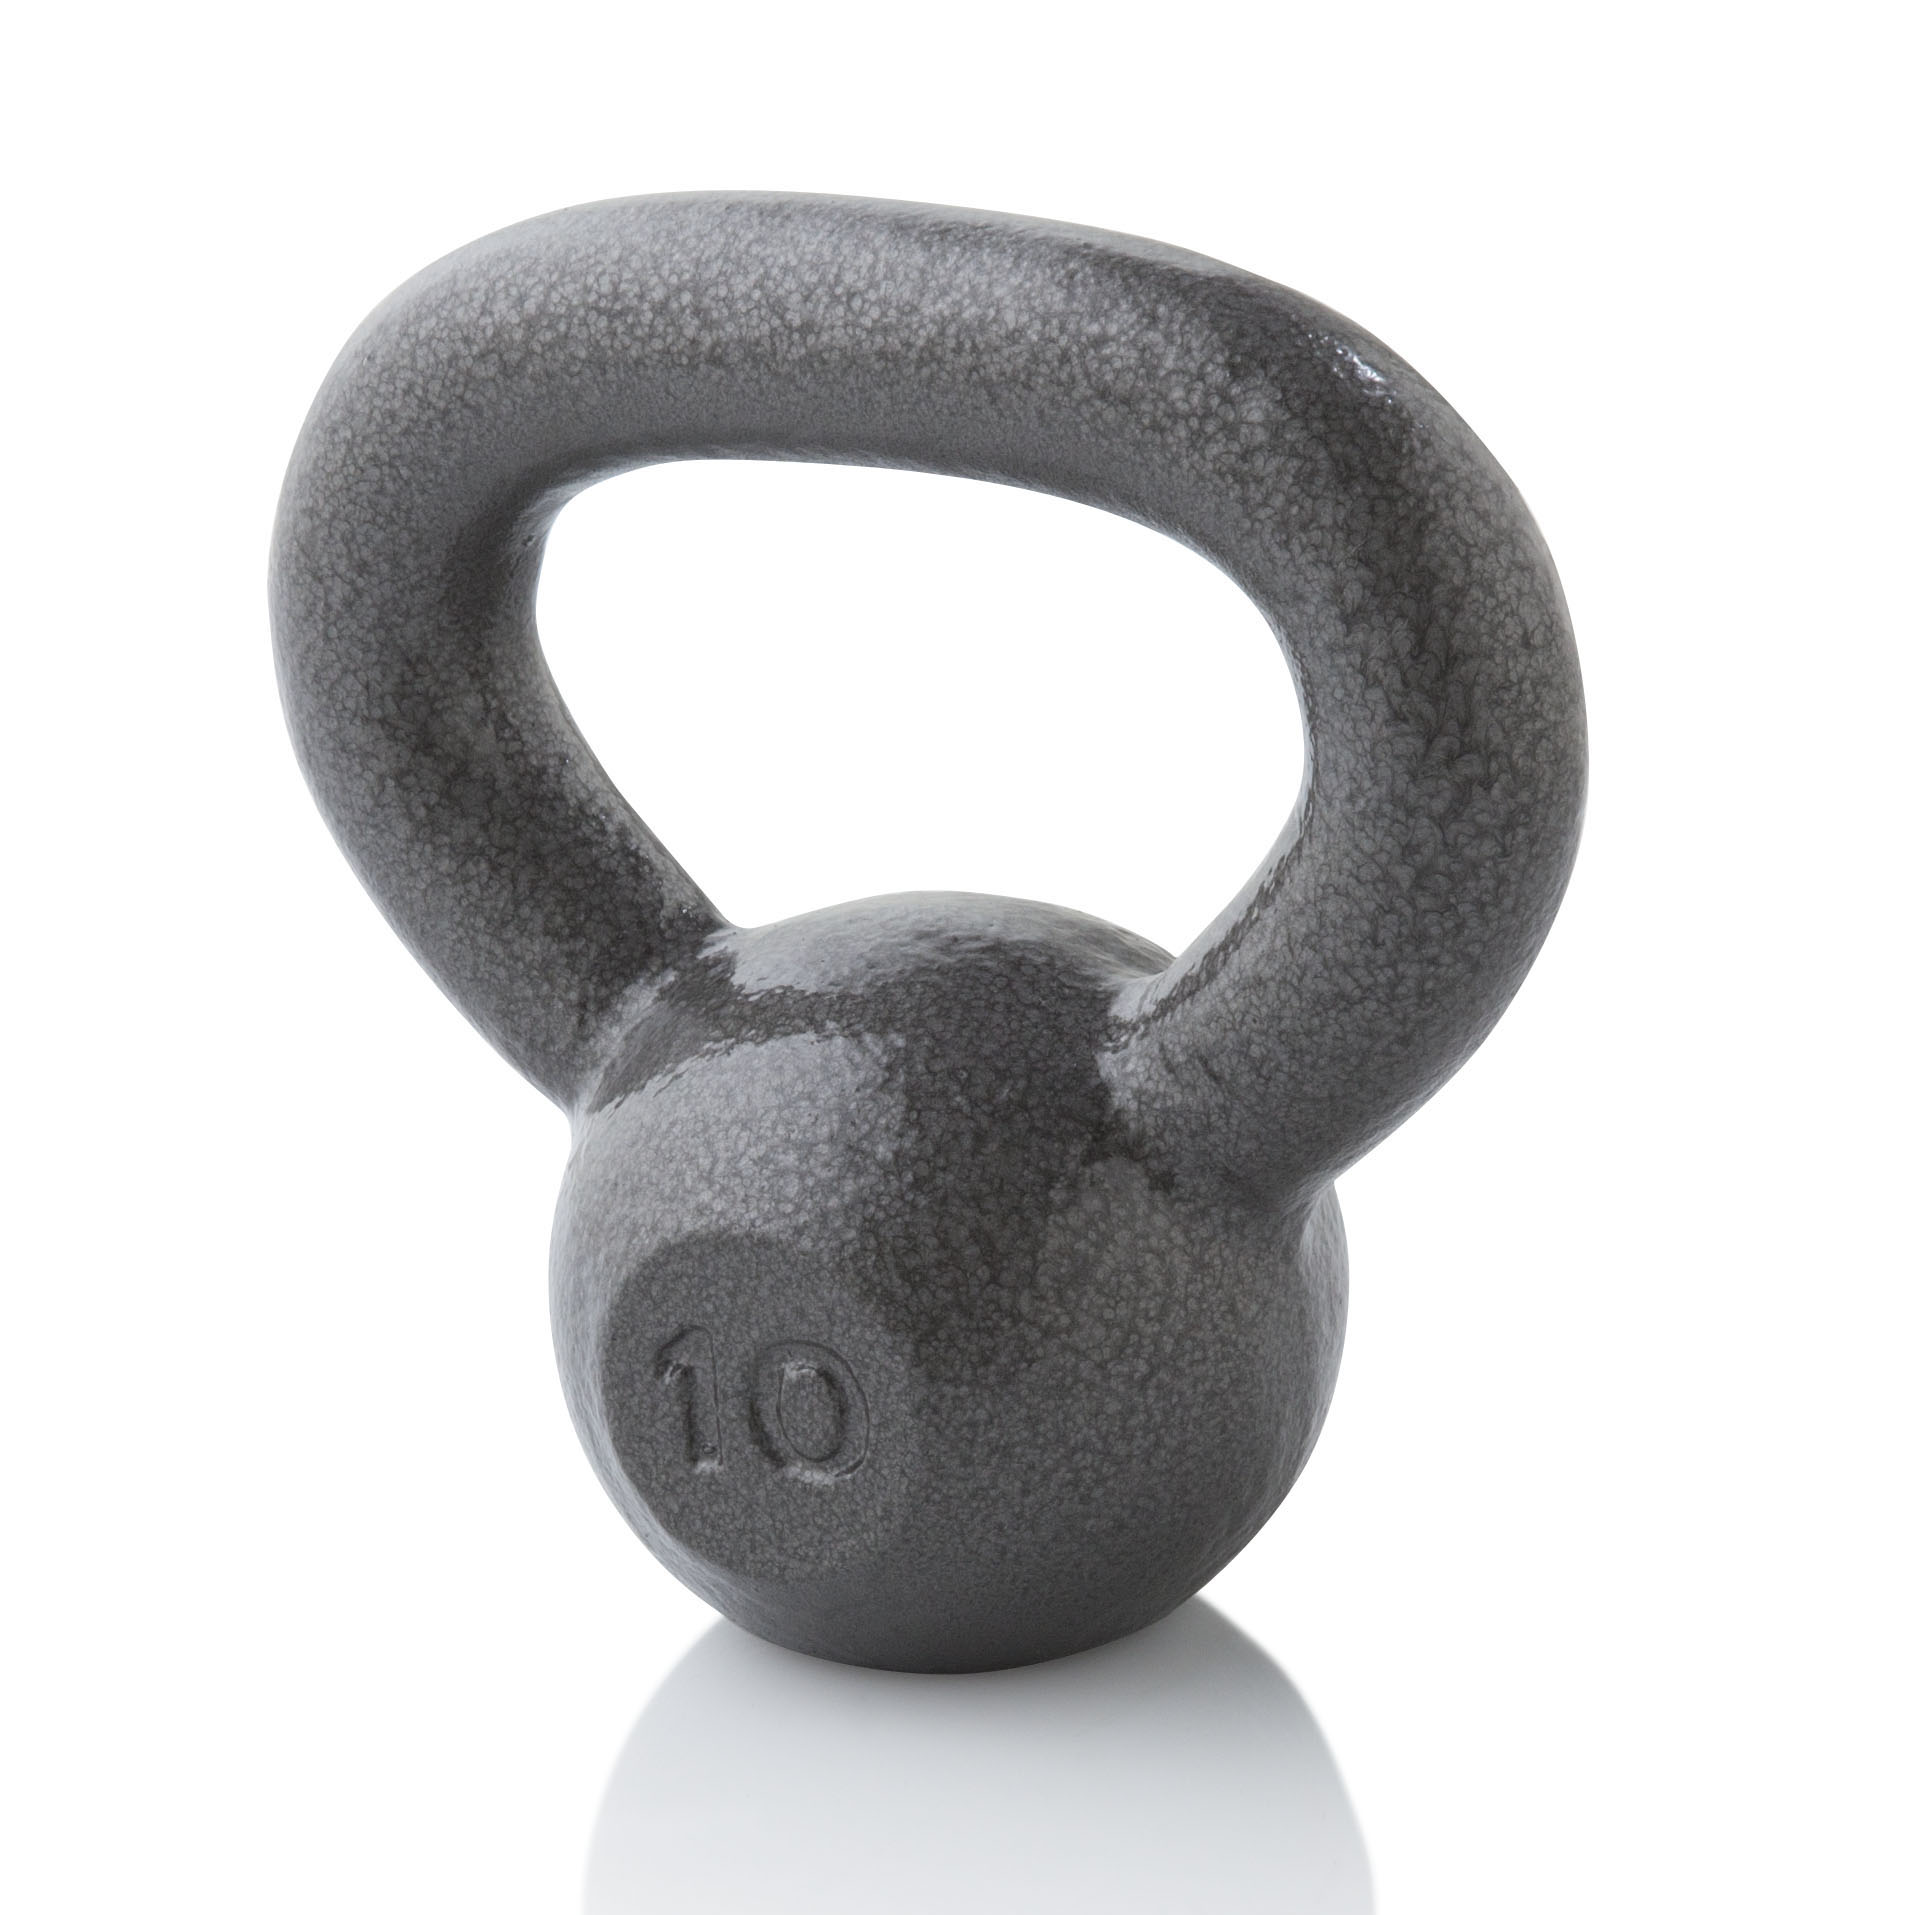 Gold's Gym Cast Iron Kettlebell, 10-35lbs